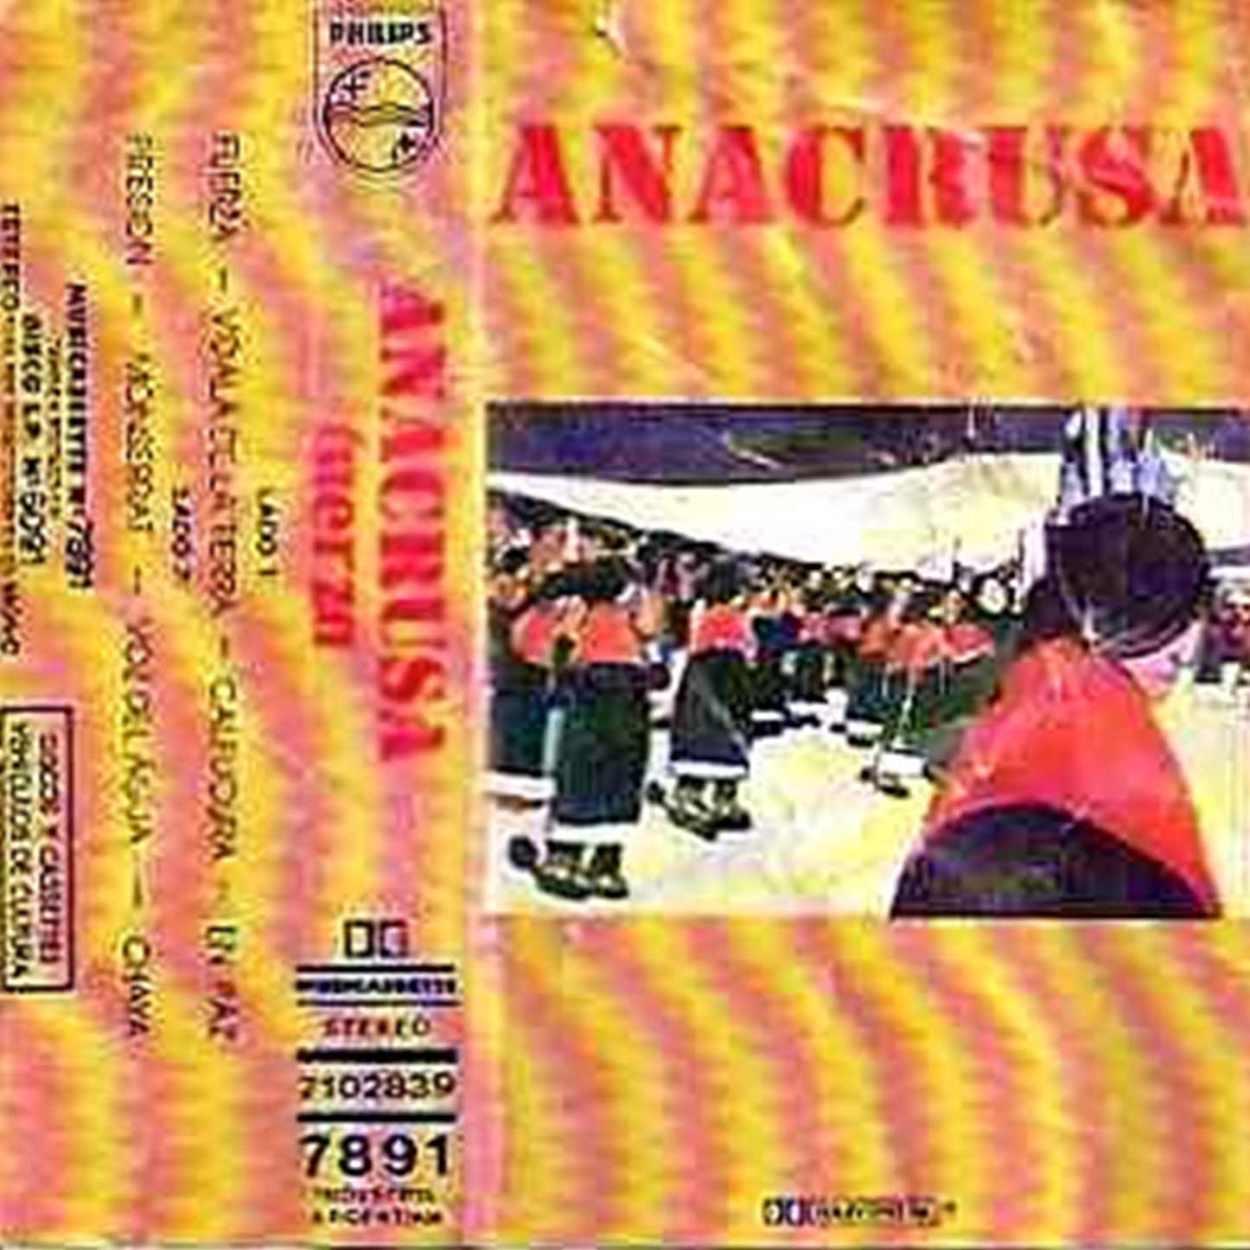 Anacrusa - El Sacrificio